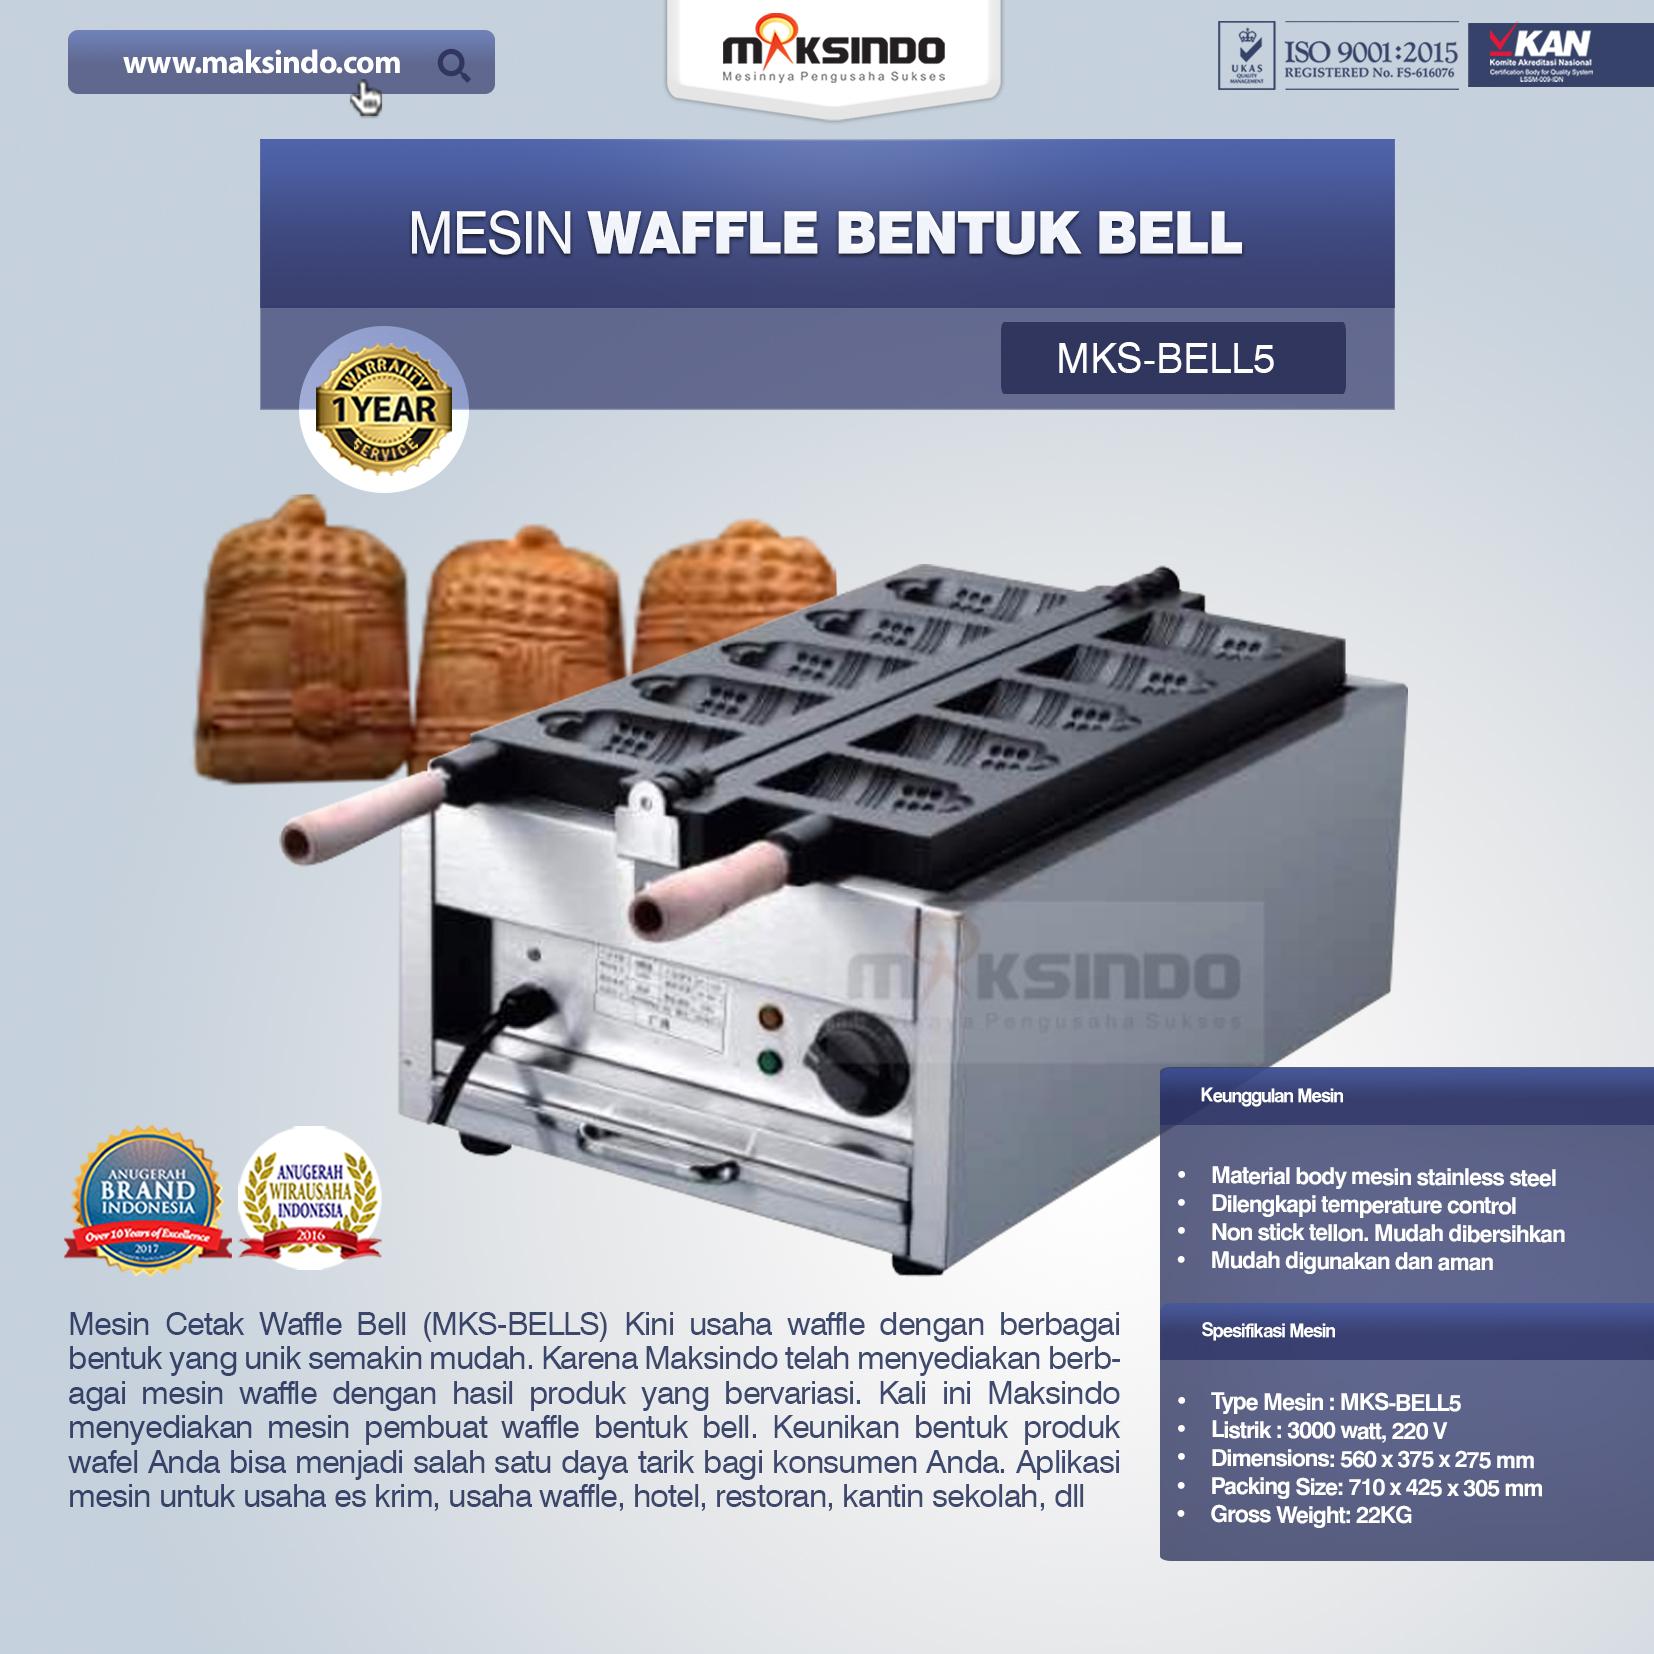 Mesin Waffle Bentuk Bell MKS-BELL5